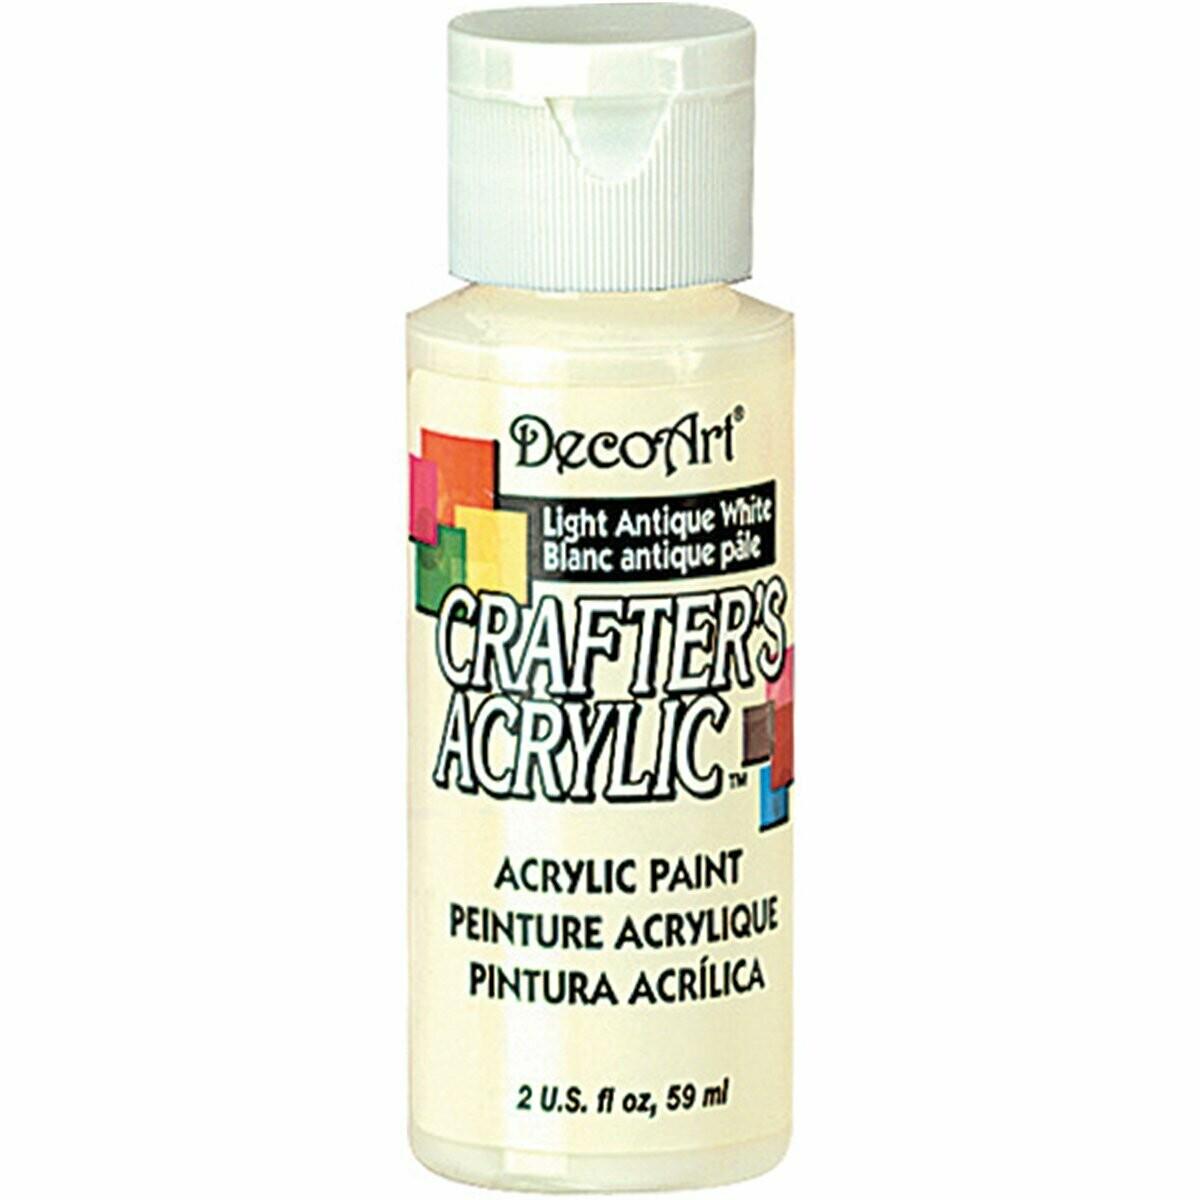 Decoart; Crafter's Acrylic Paint, 2 Oz. Bottles, Antique White